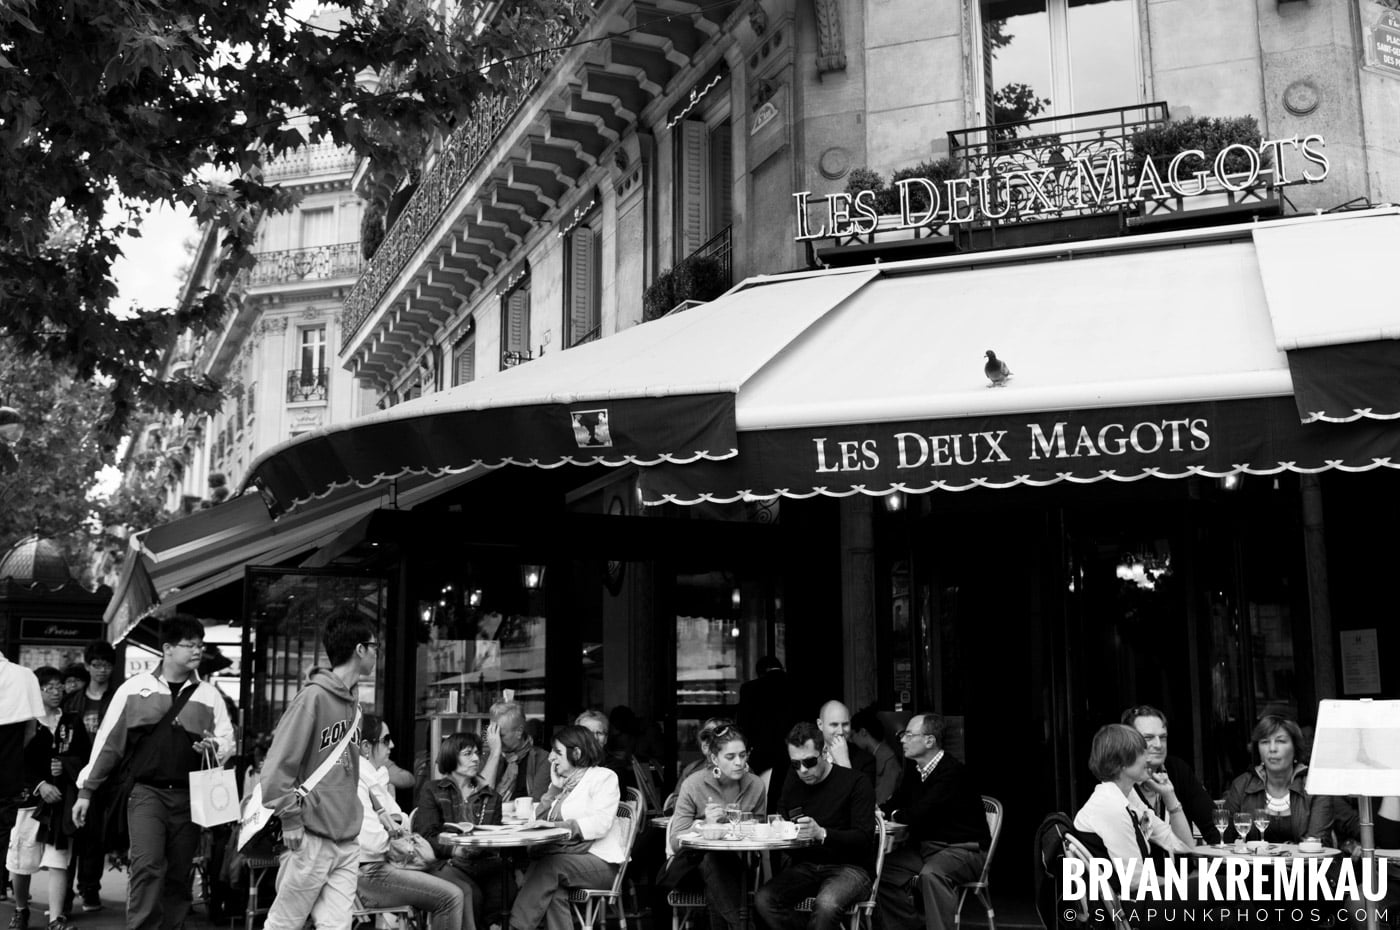 Paris, France Honeymoon - Day 1 - 7.18.11 (14)